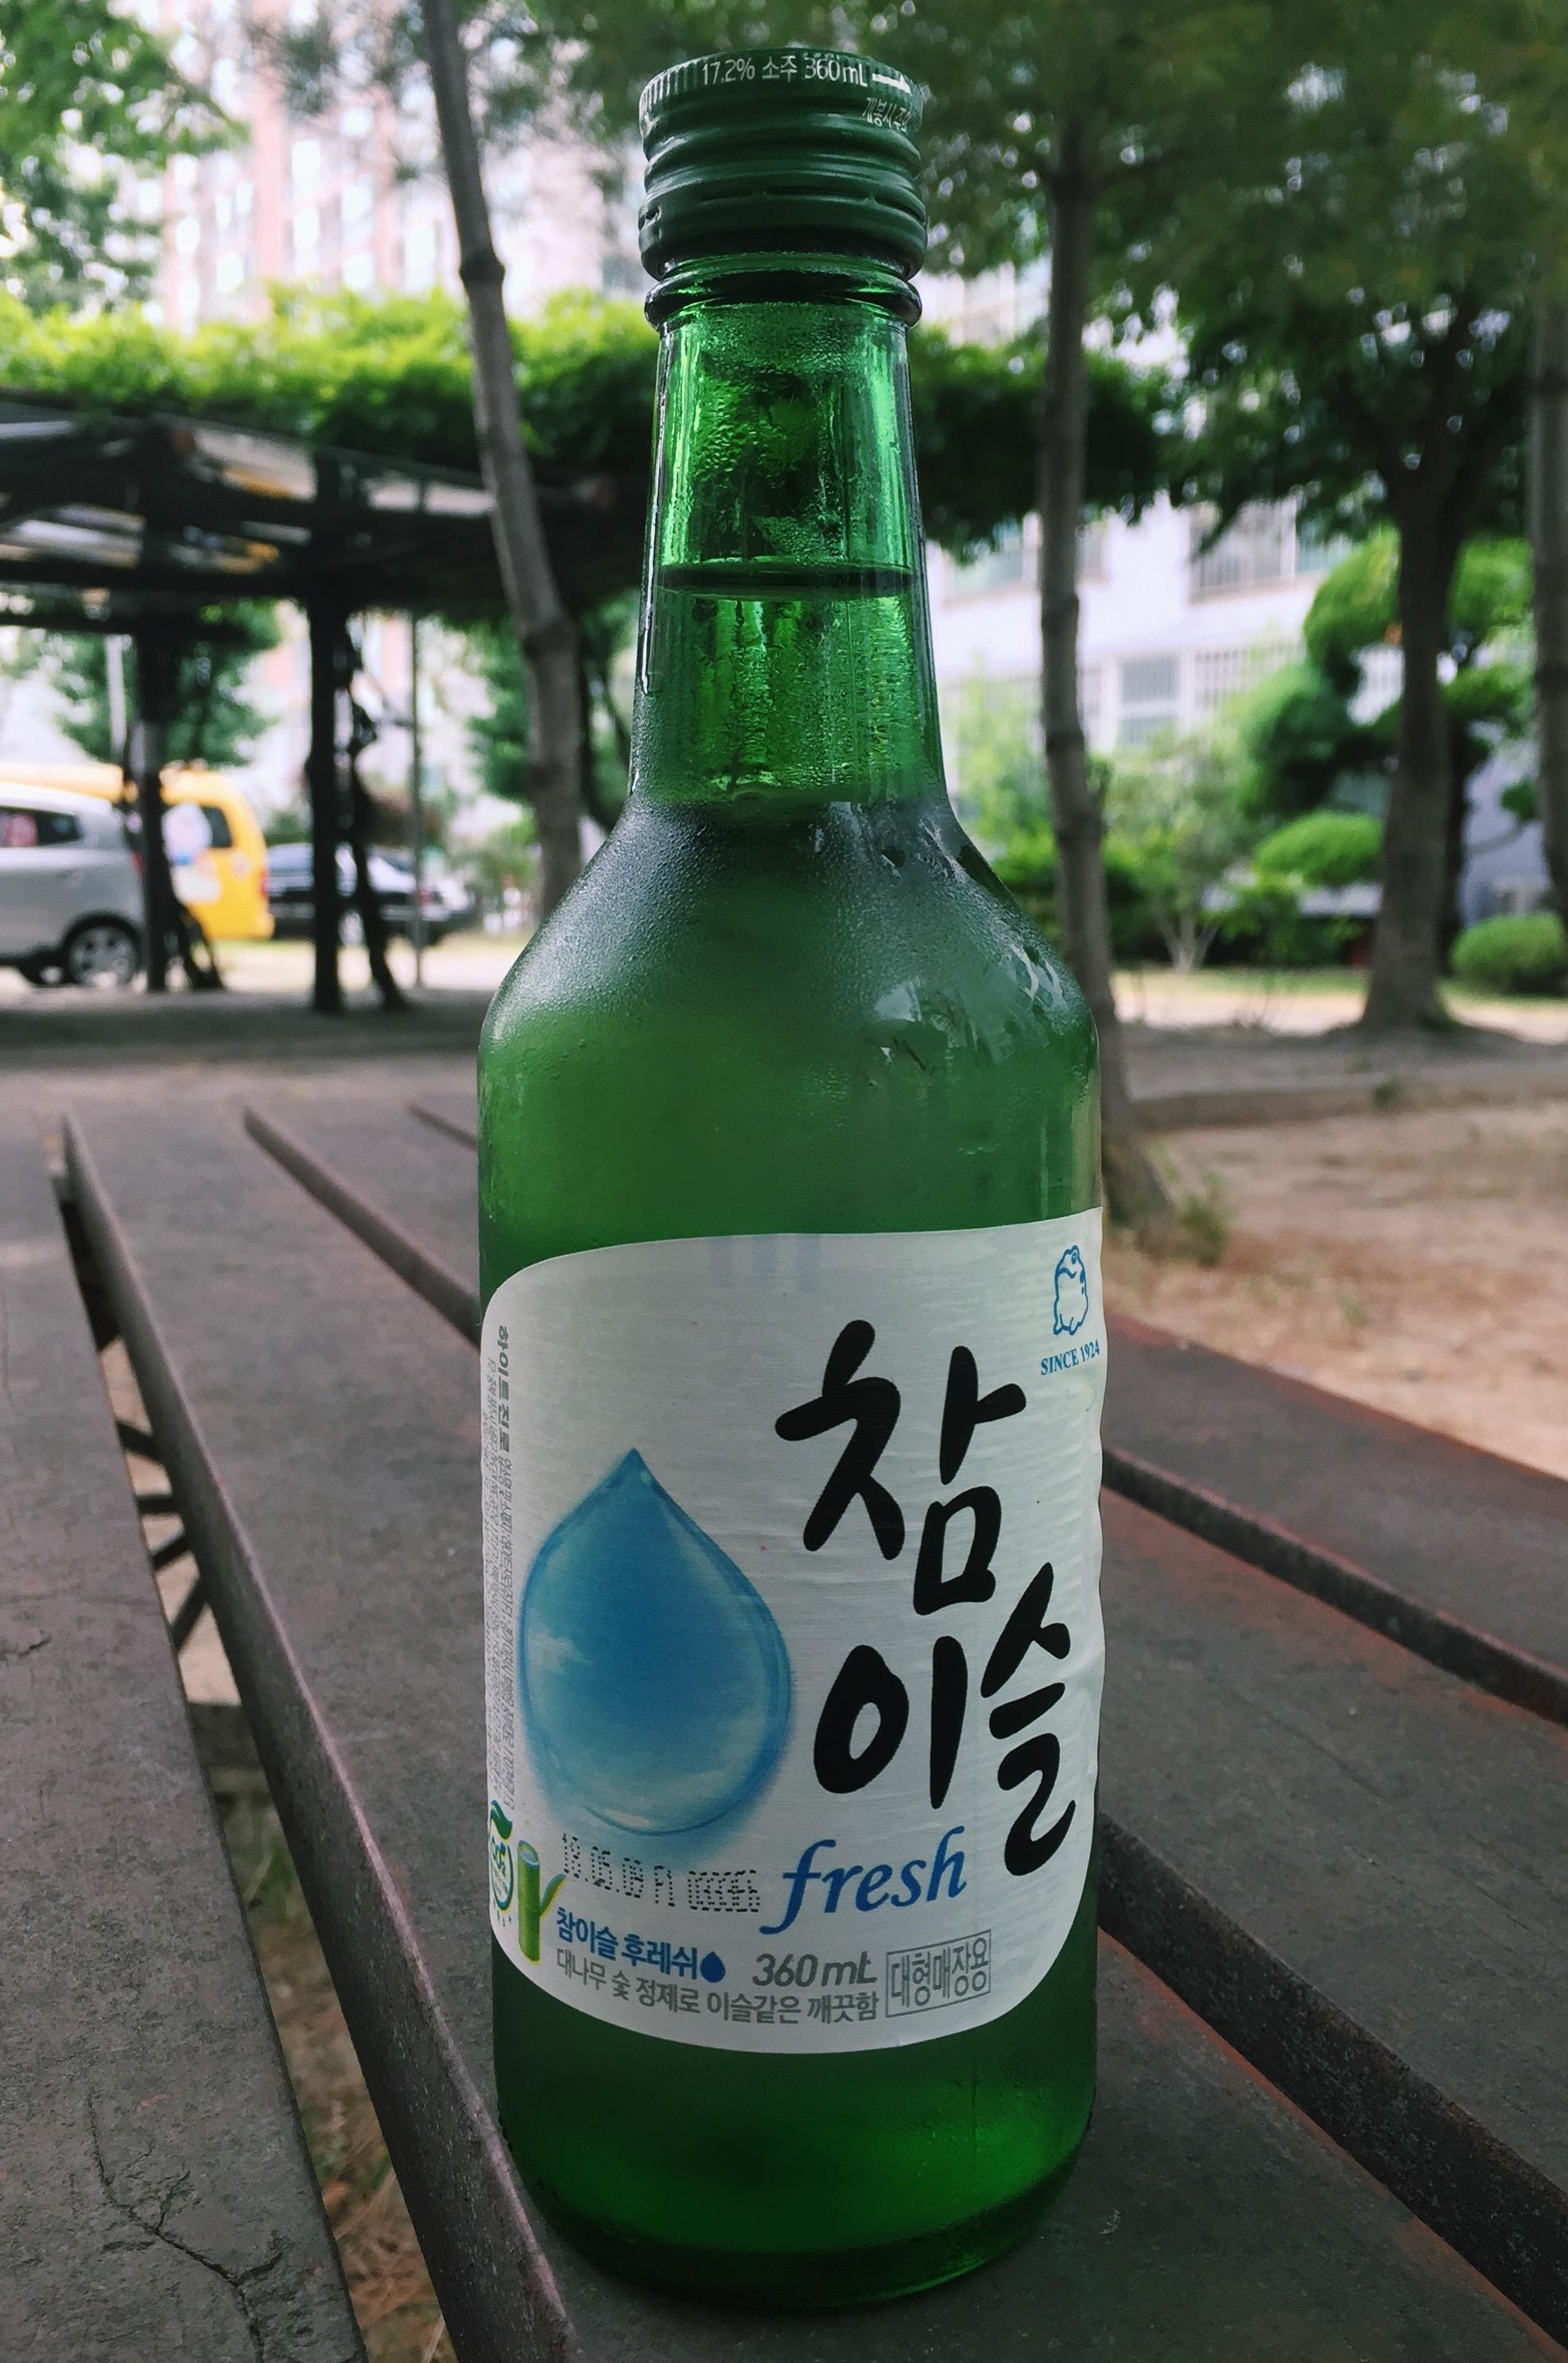 fresh flavoured soju korea